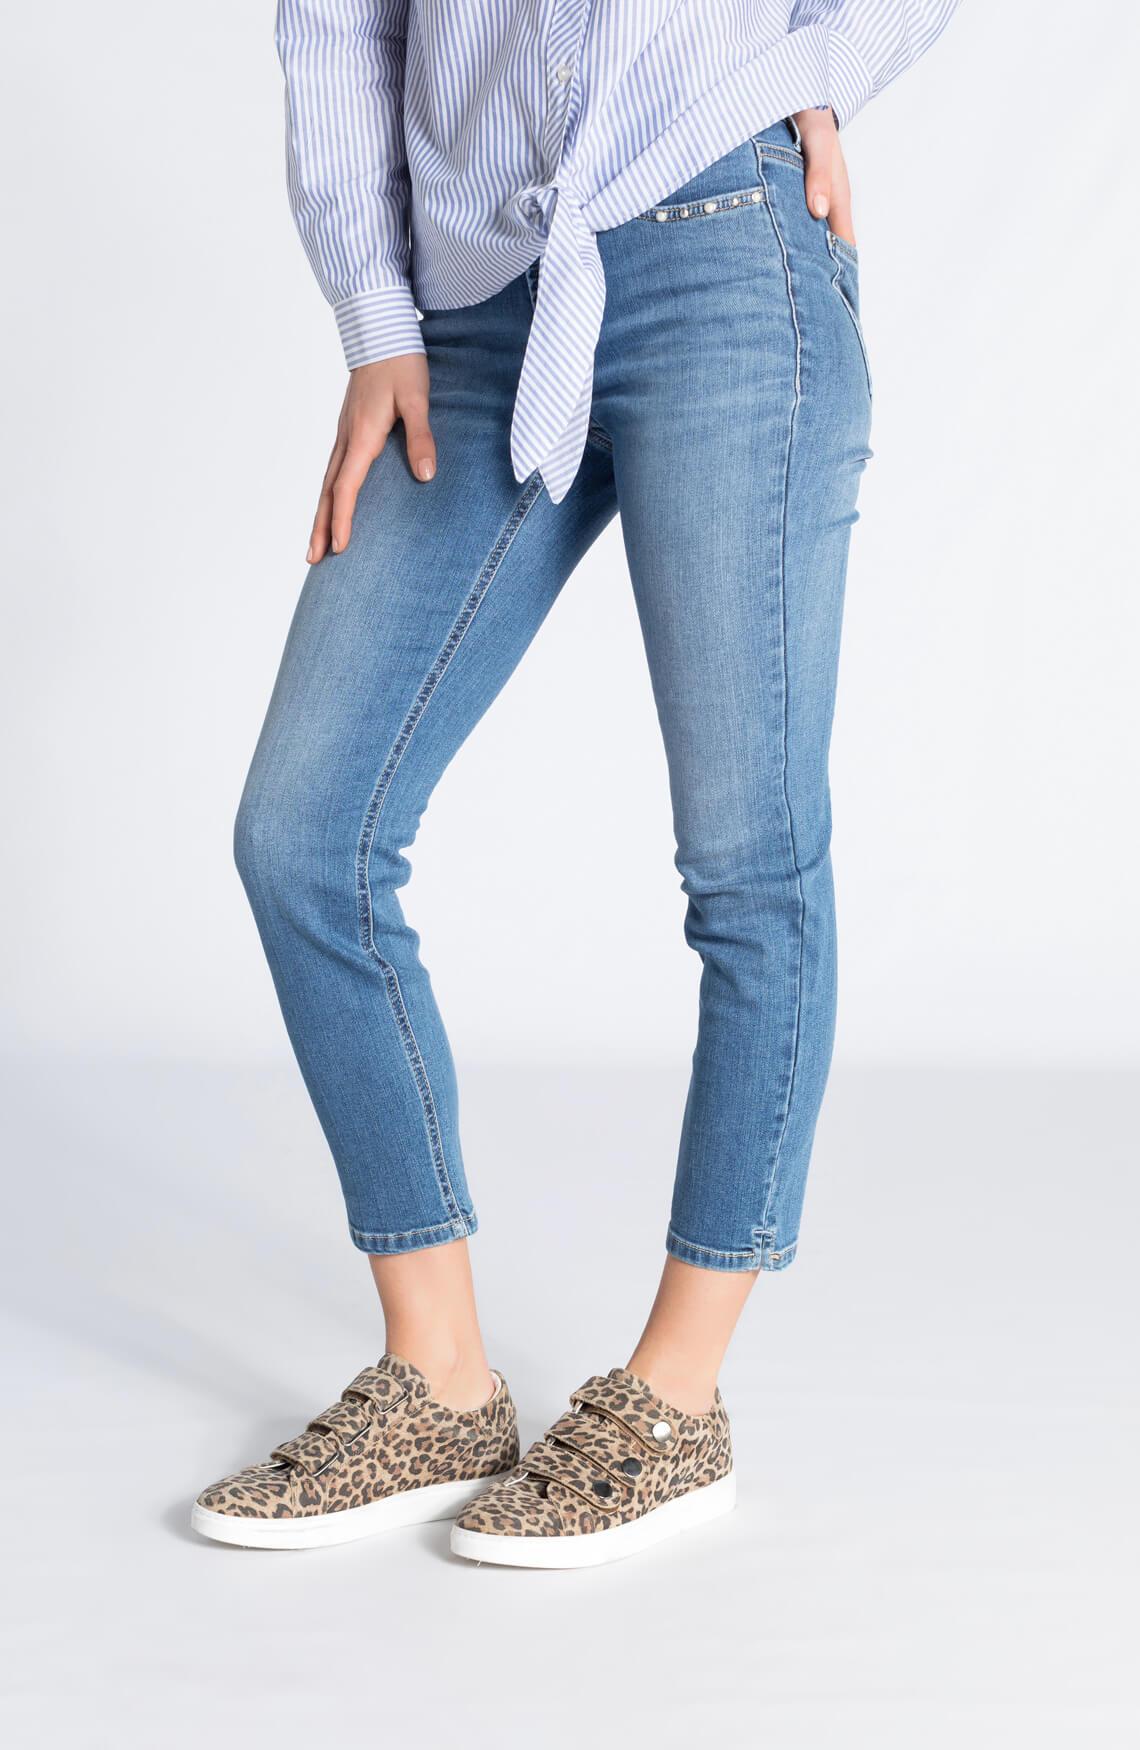 Cambio Dames Piper jeans met parels Blauw